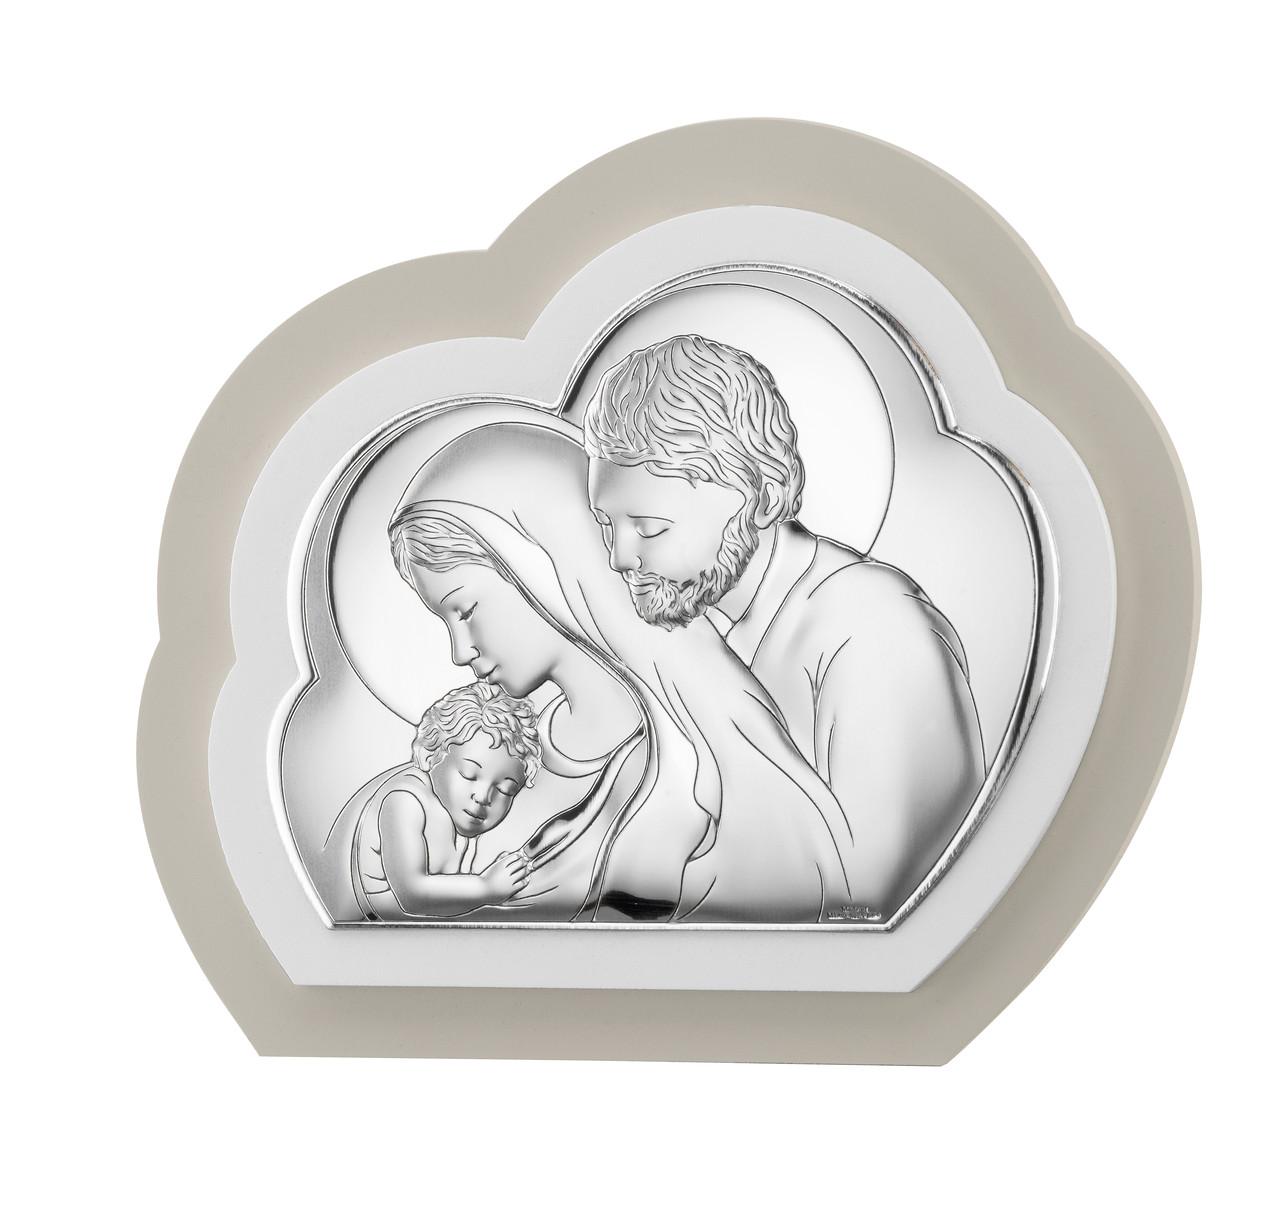 "Икона серебряная  ""Святая Семья"" (15.5х13.5см) TP 81245 2LGW"